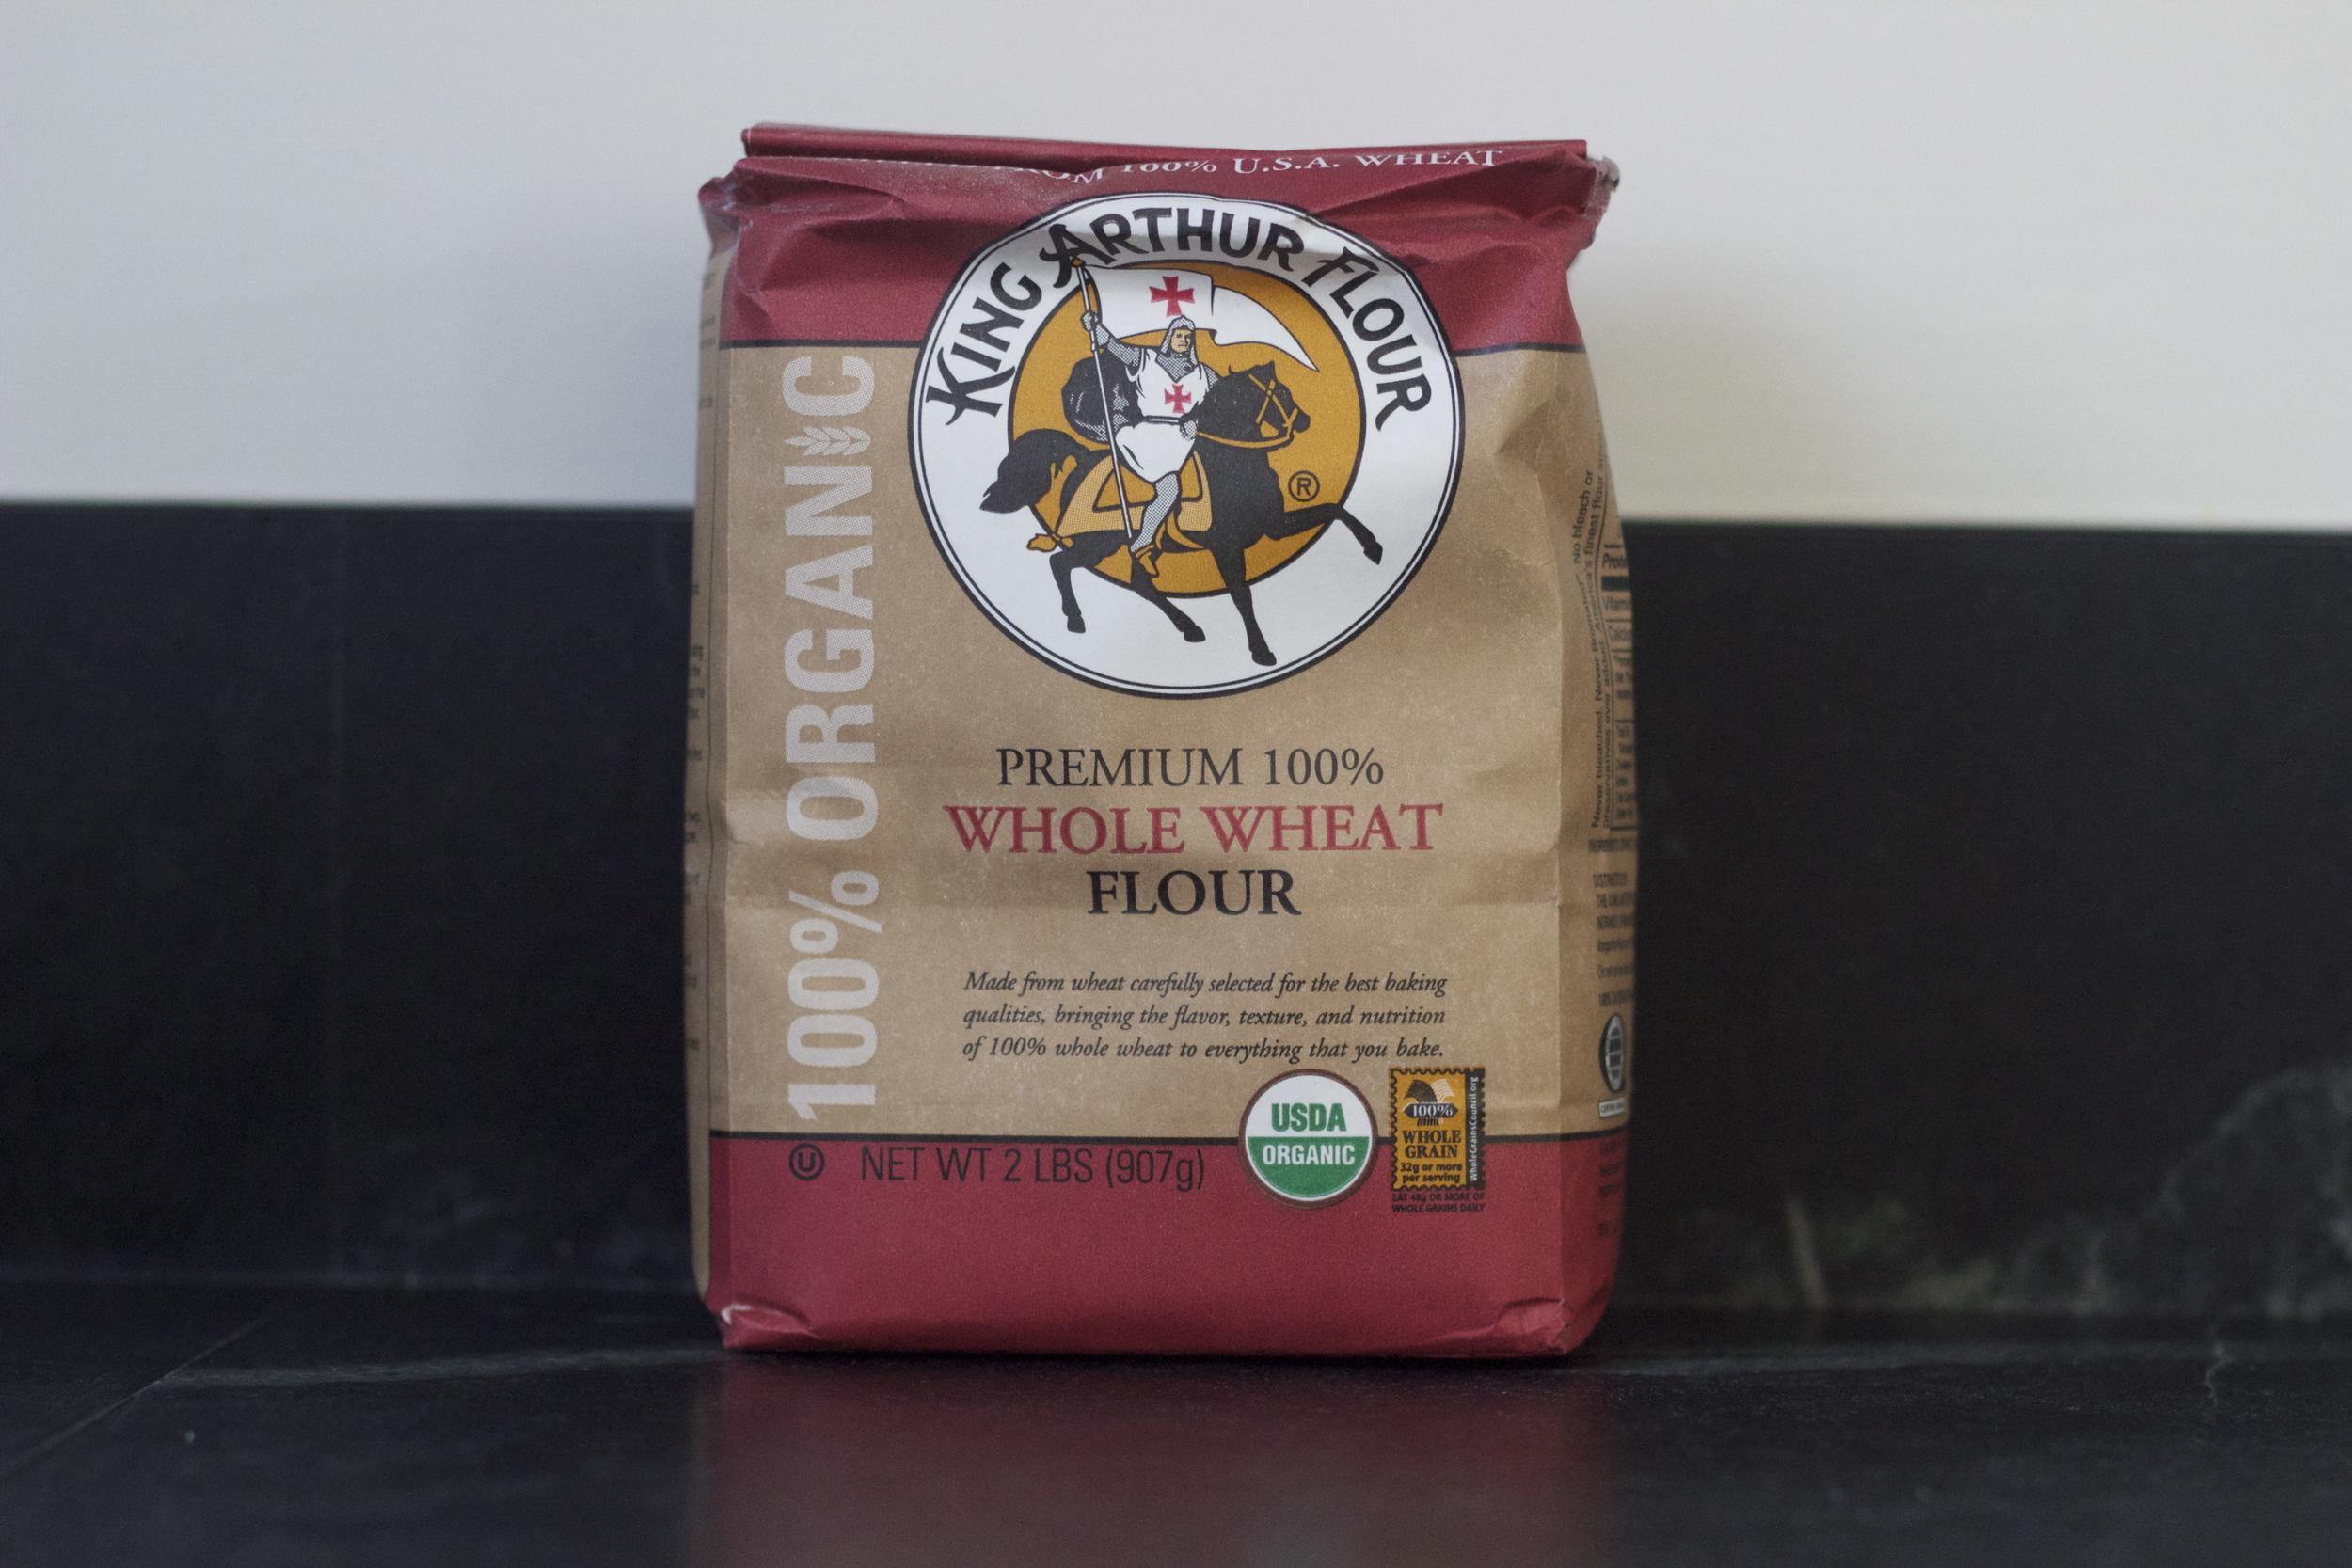 King Arthur Flour Whole Wheat